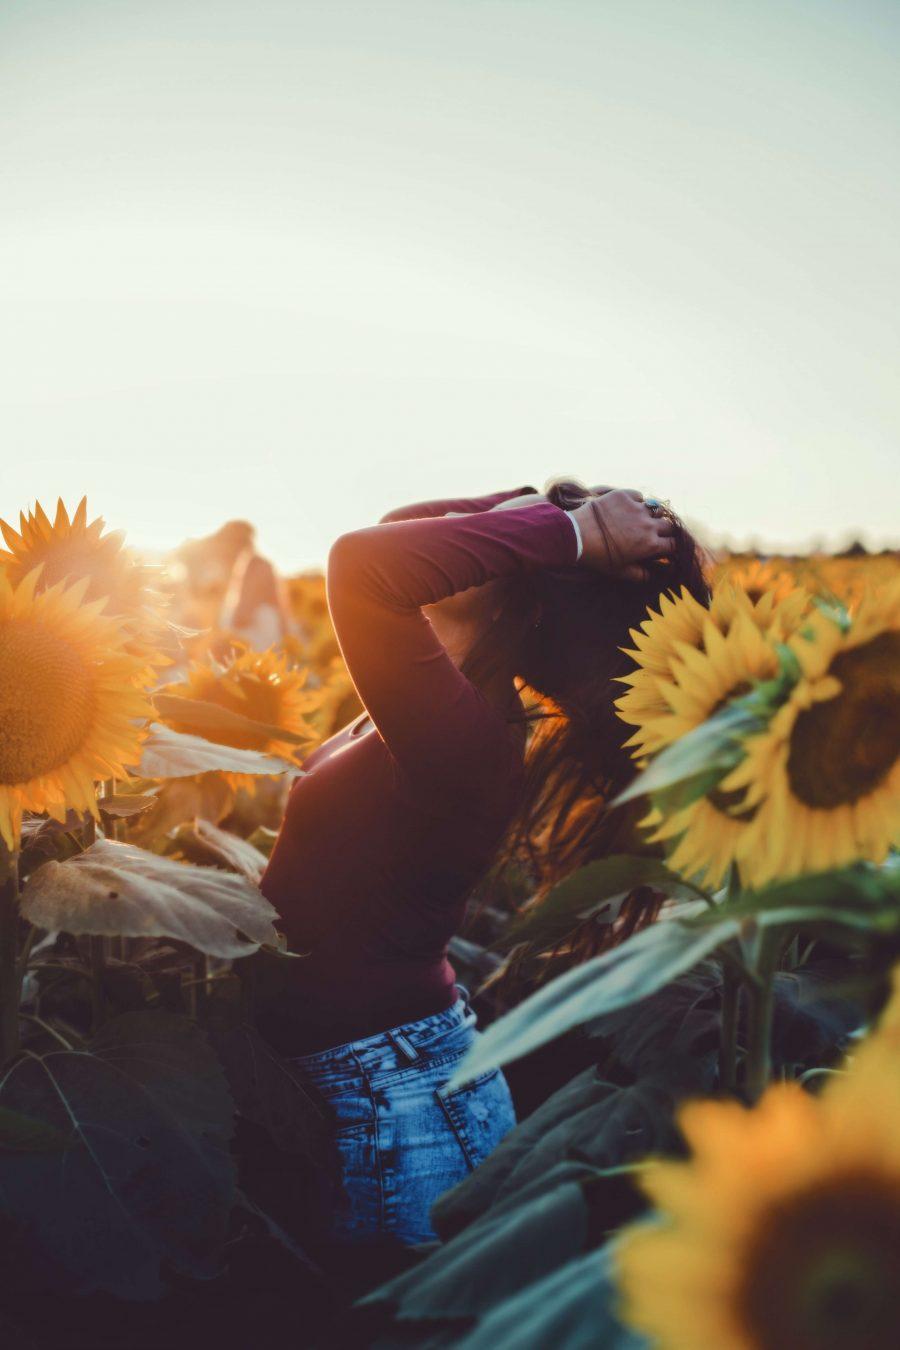 exposición solar-rayos de sol- vitamina d